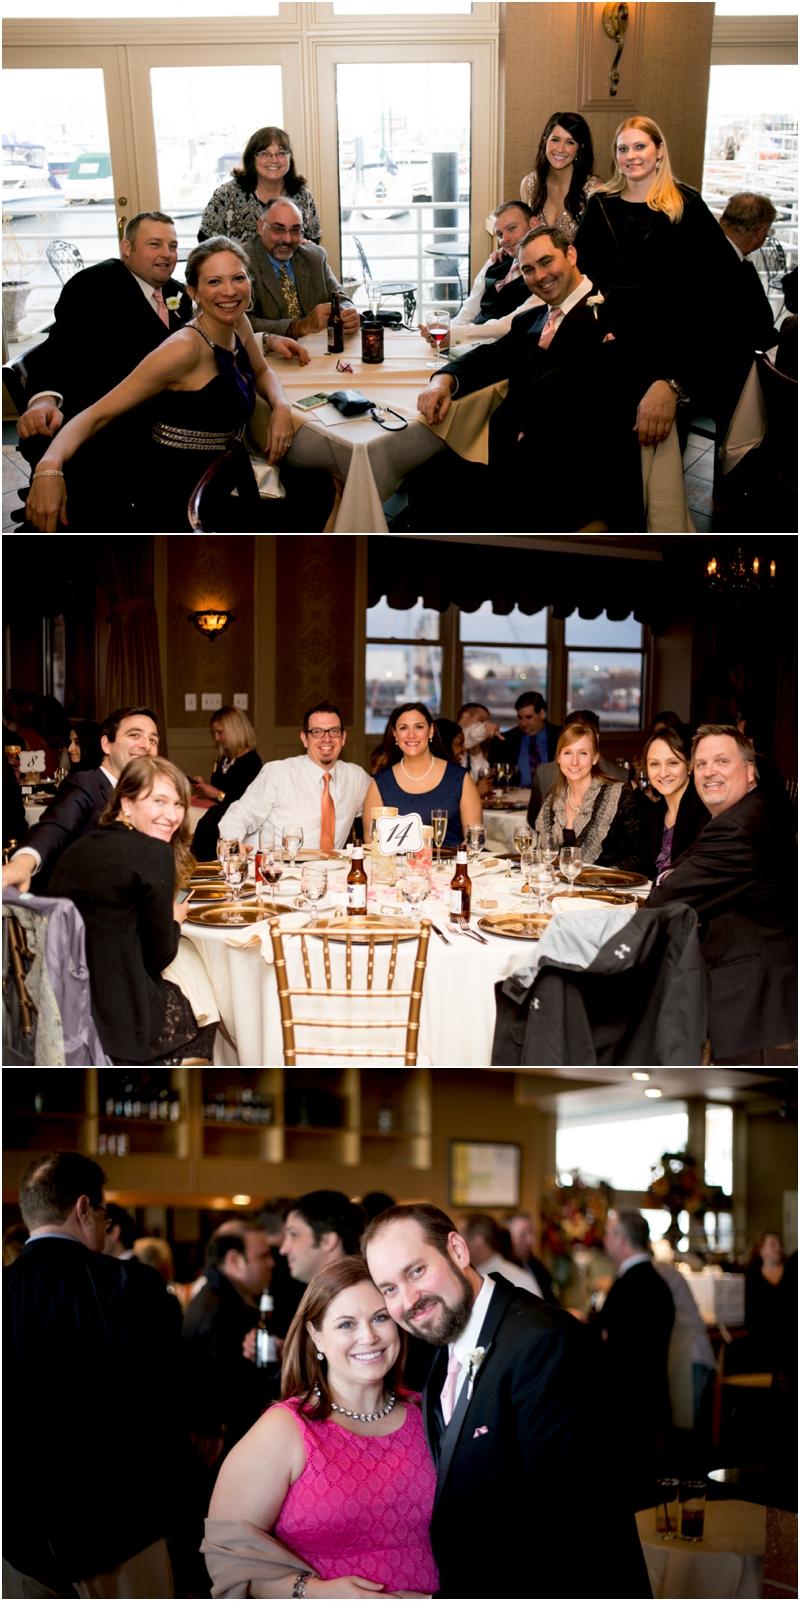 jason-liz-gill-wedding-tabrizis-downtown-baltimore-inner-harbor-living-radiant-photography-weddings-federal-hill-canton-square_0076.jpg